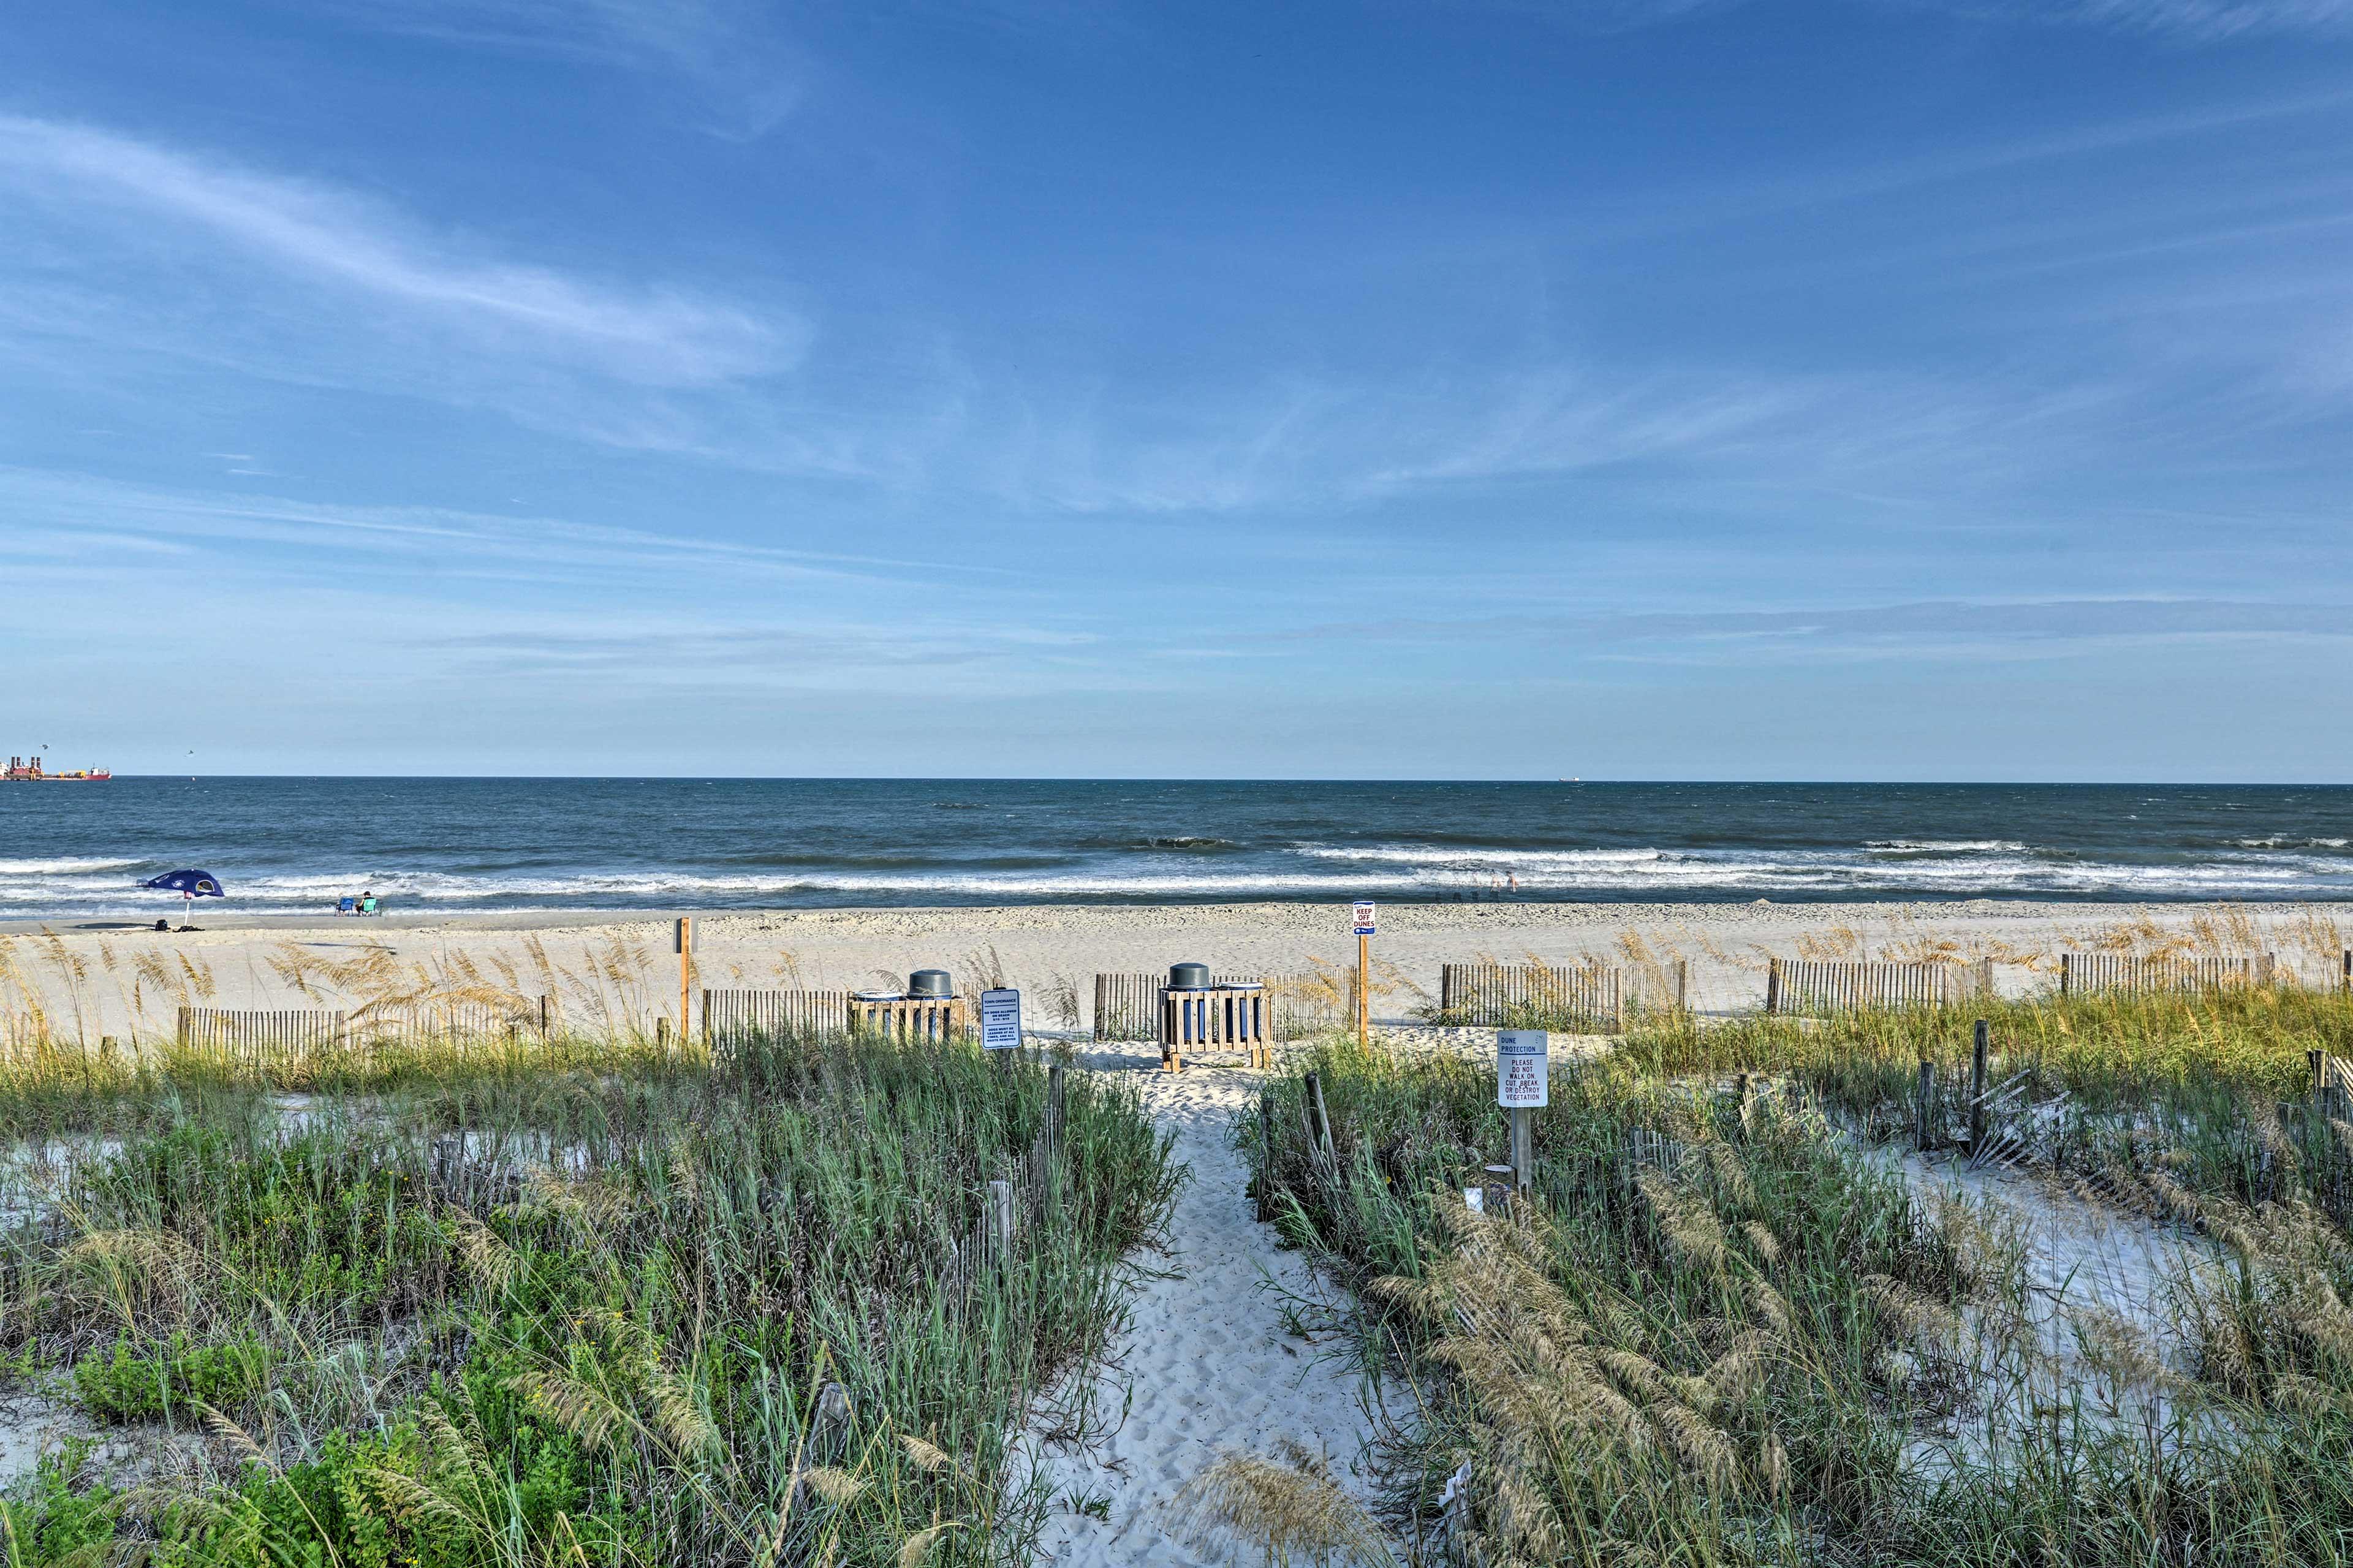 Sunbathe, build sandcastles, and enjoy long strolls by the ocean!